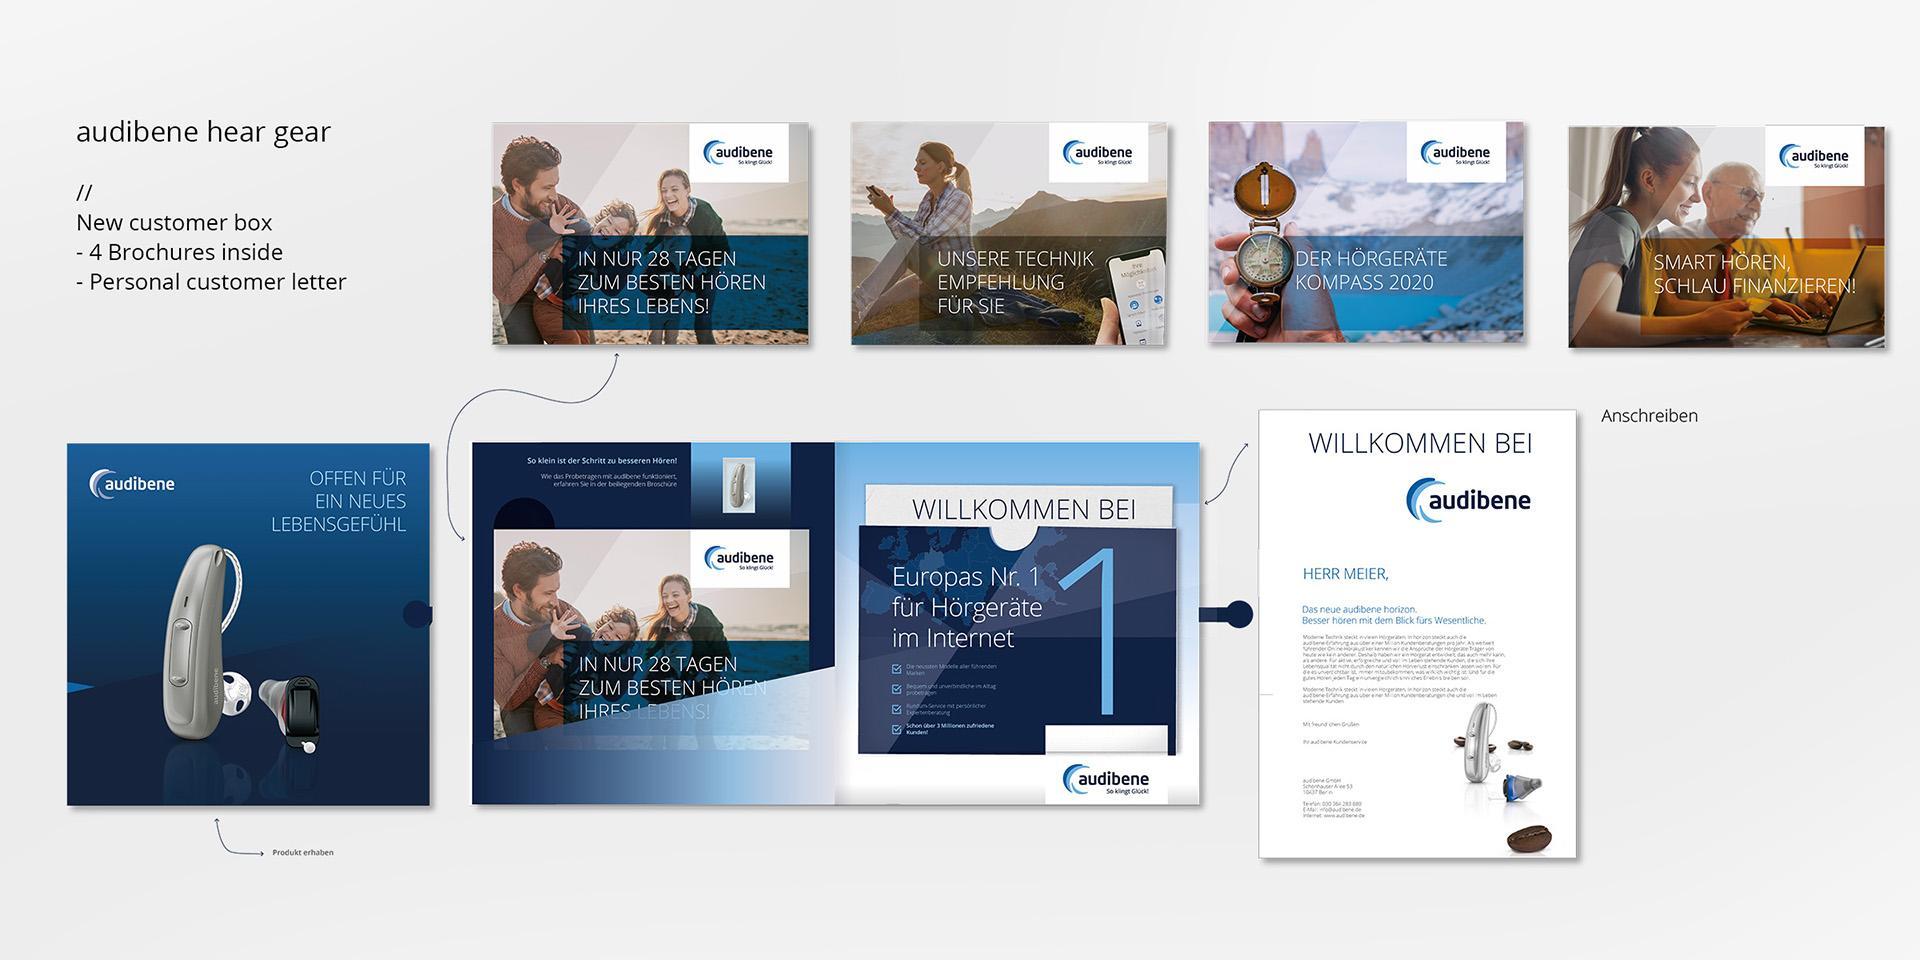 gfd ab et werbeagentur werbung grafik print Kreativ agentur muenchen full service 360 marketing